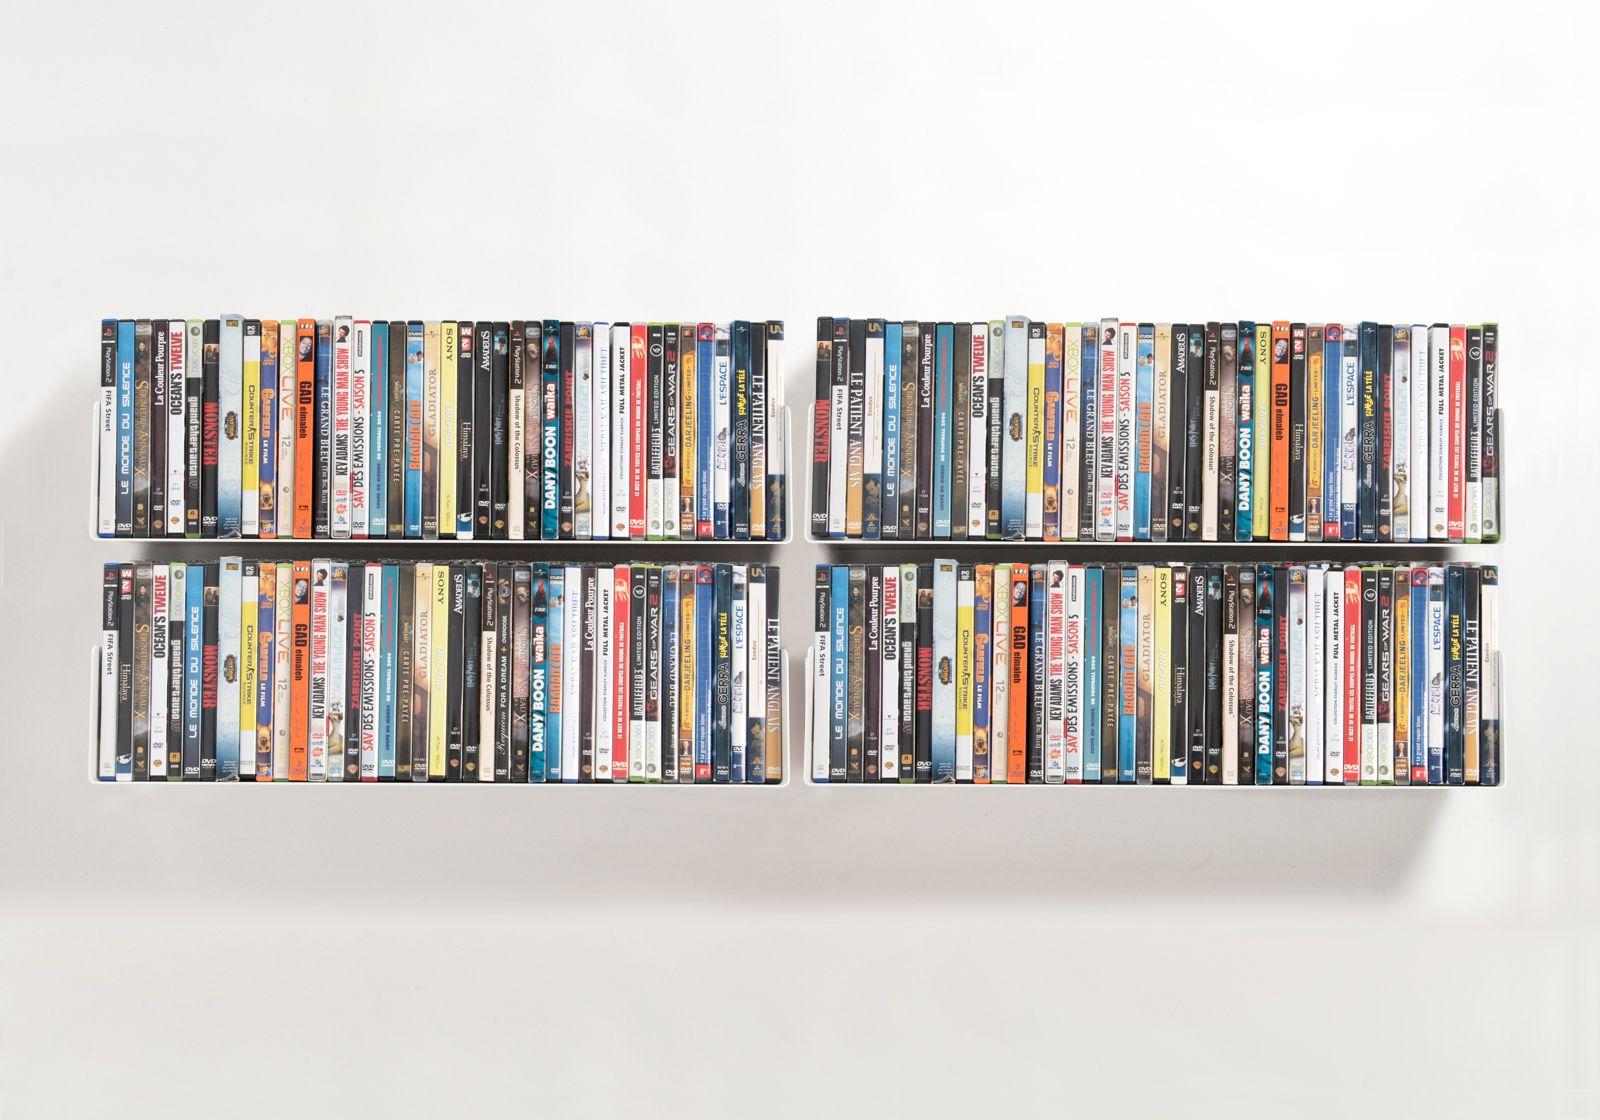 Awe Inspiring Dvd Shelves Dvd Shelving Unit By Teebooks Teebooks Interior Design Ideas Gentotryabchikinfo